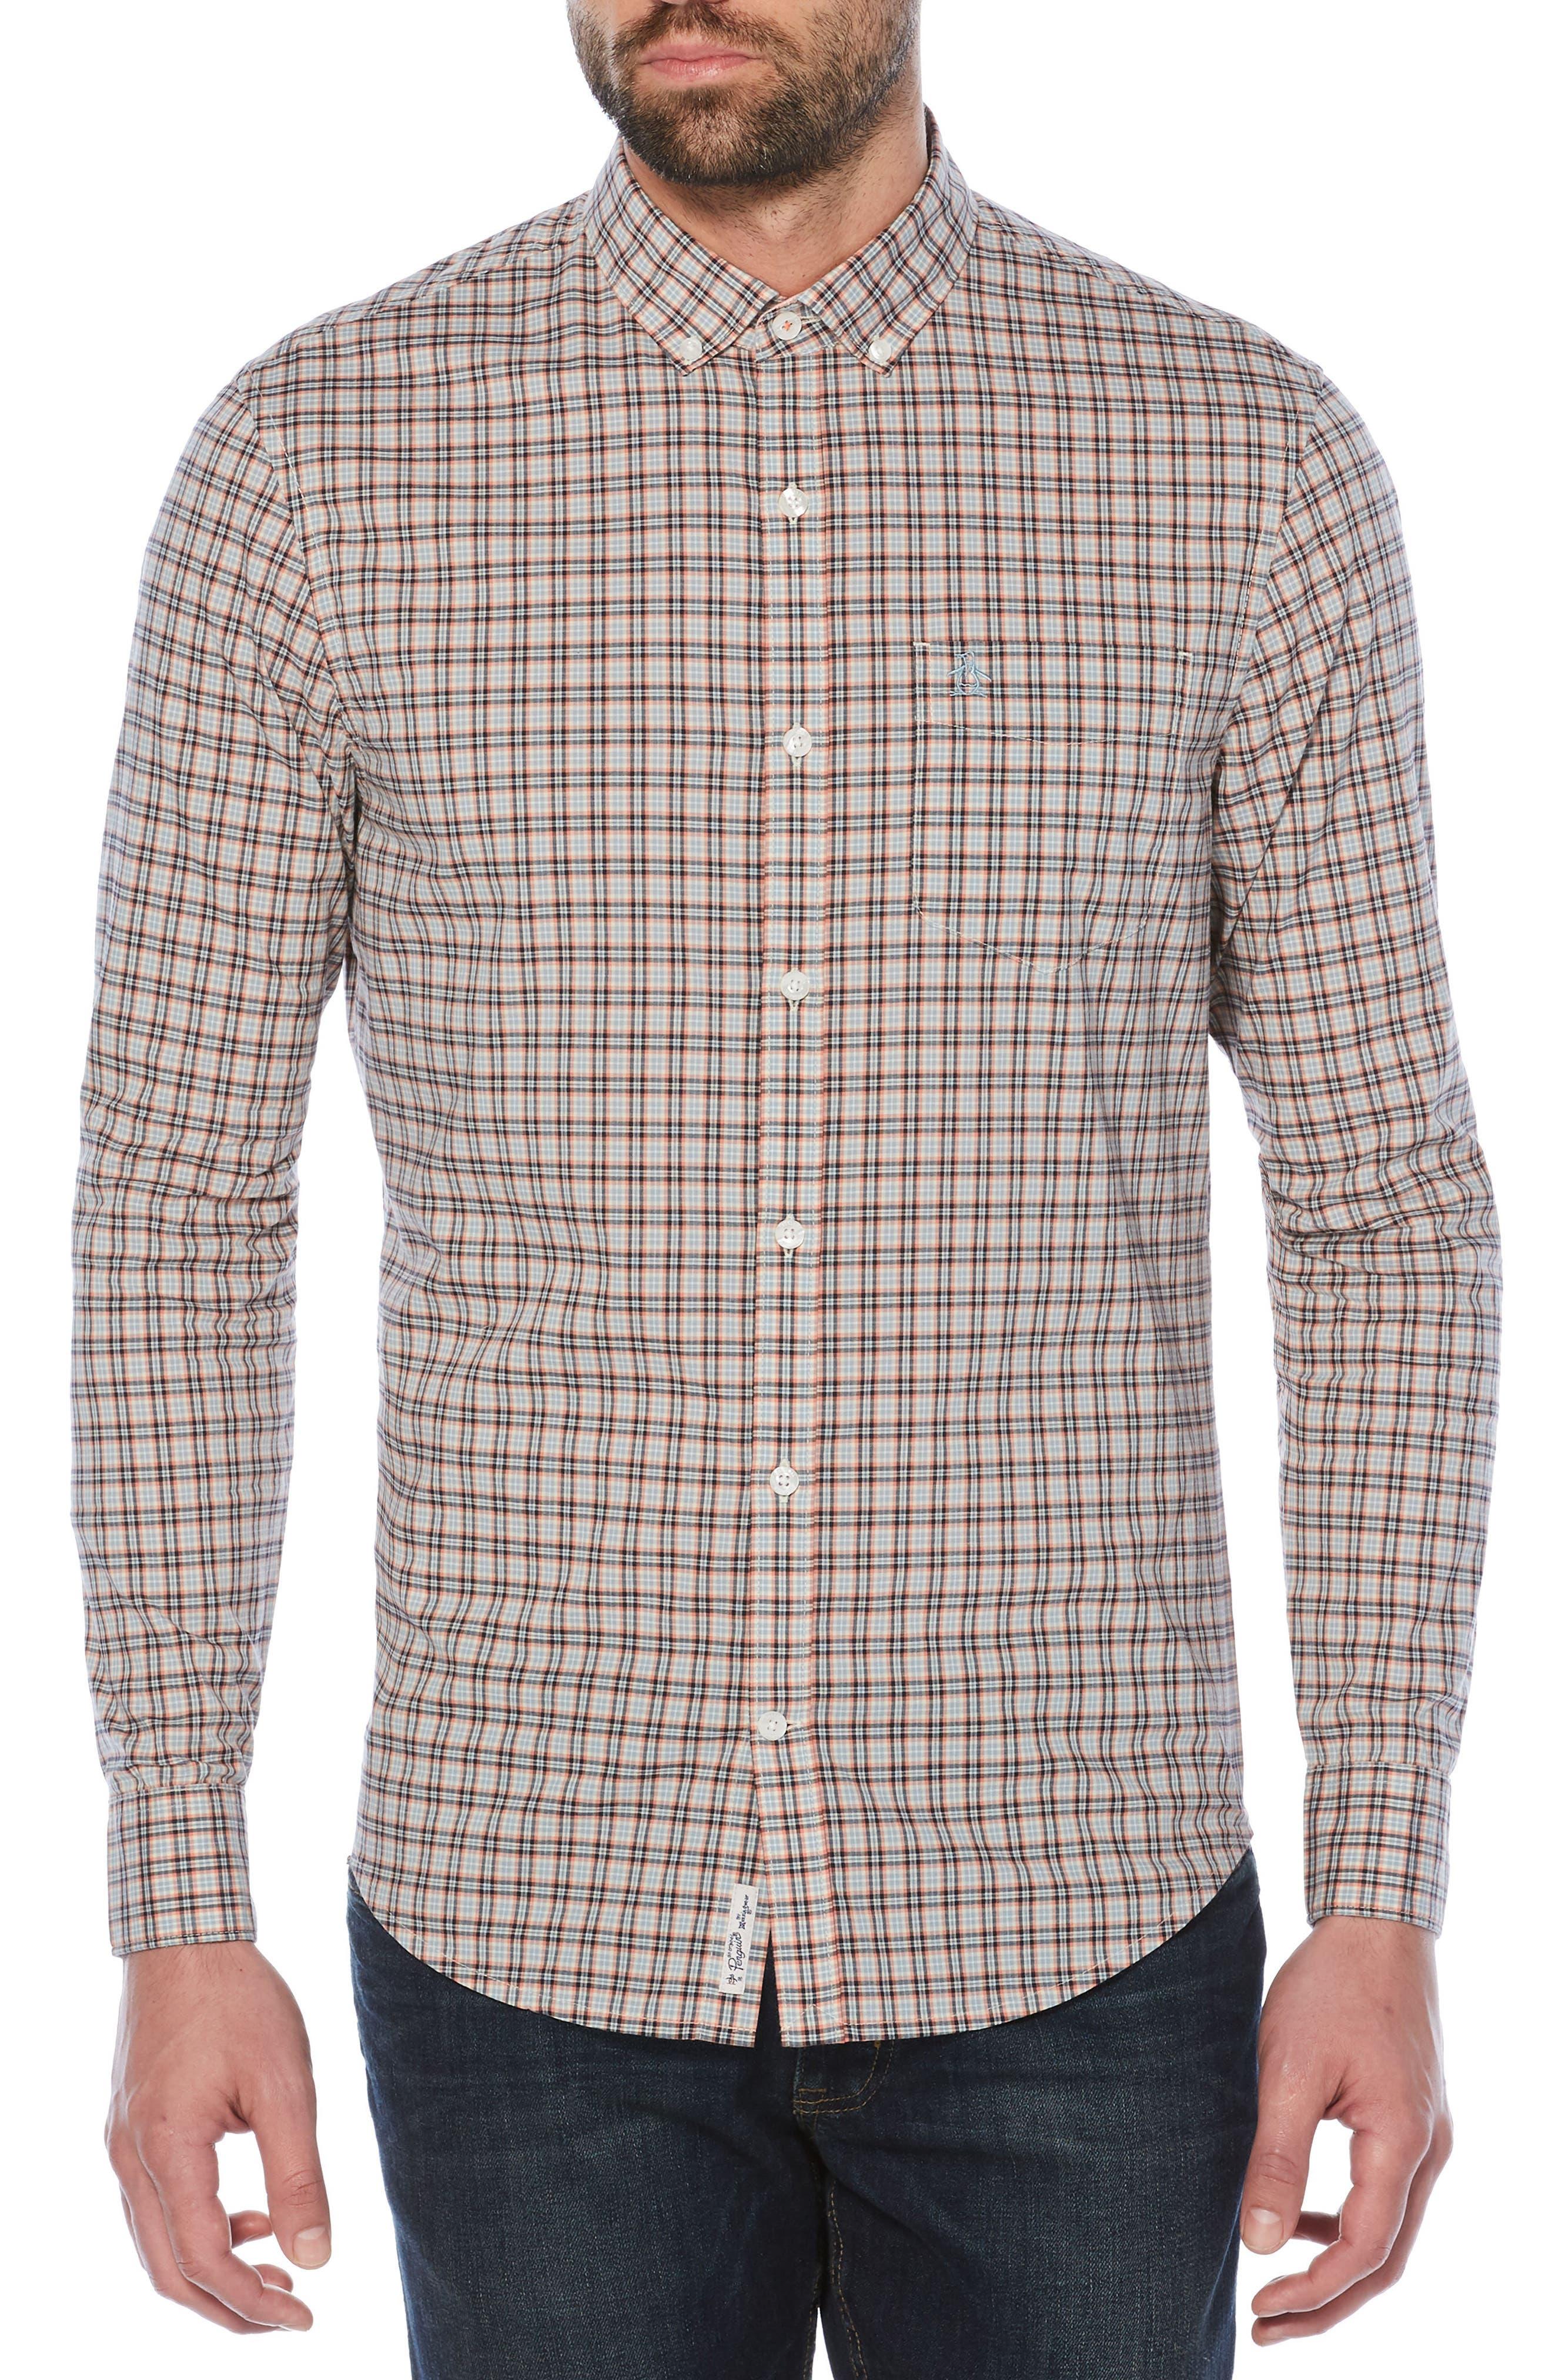 P55 Plaid Shirt,                             Main thumbnail 1, color,                             840